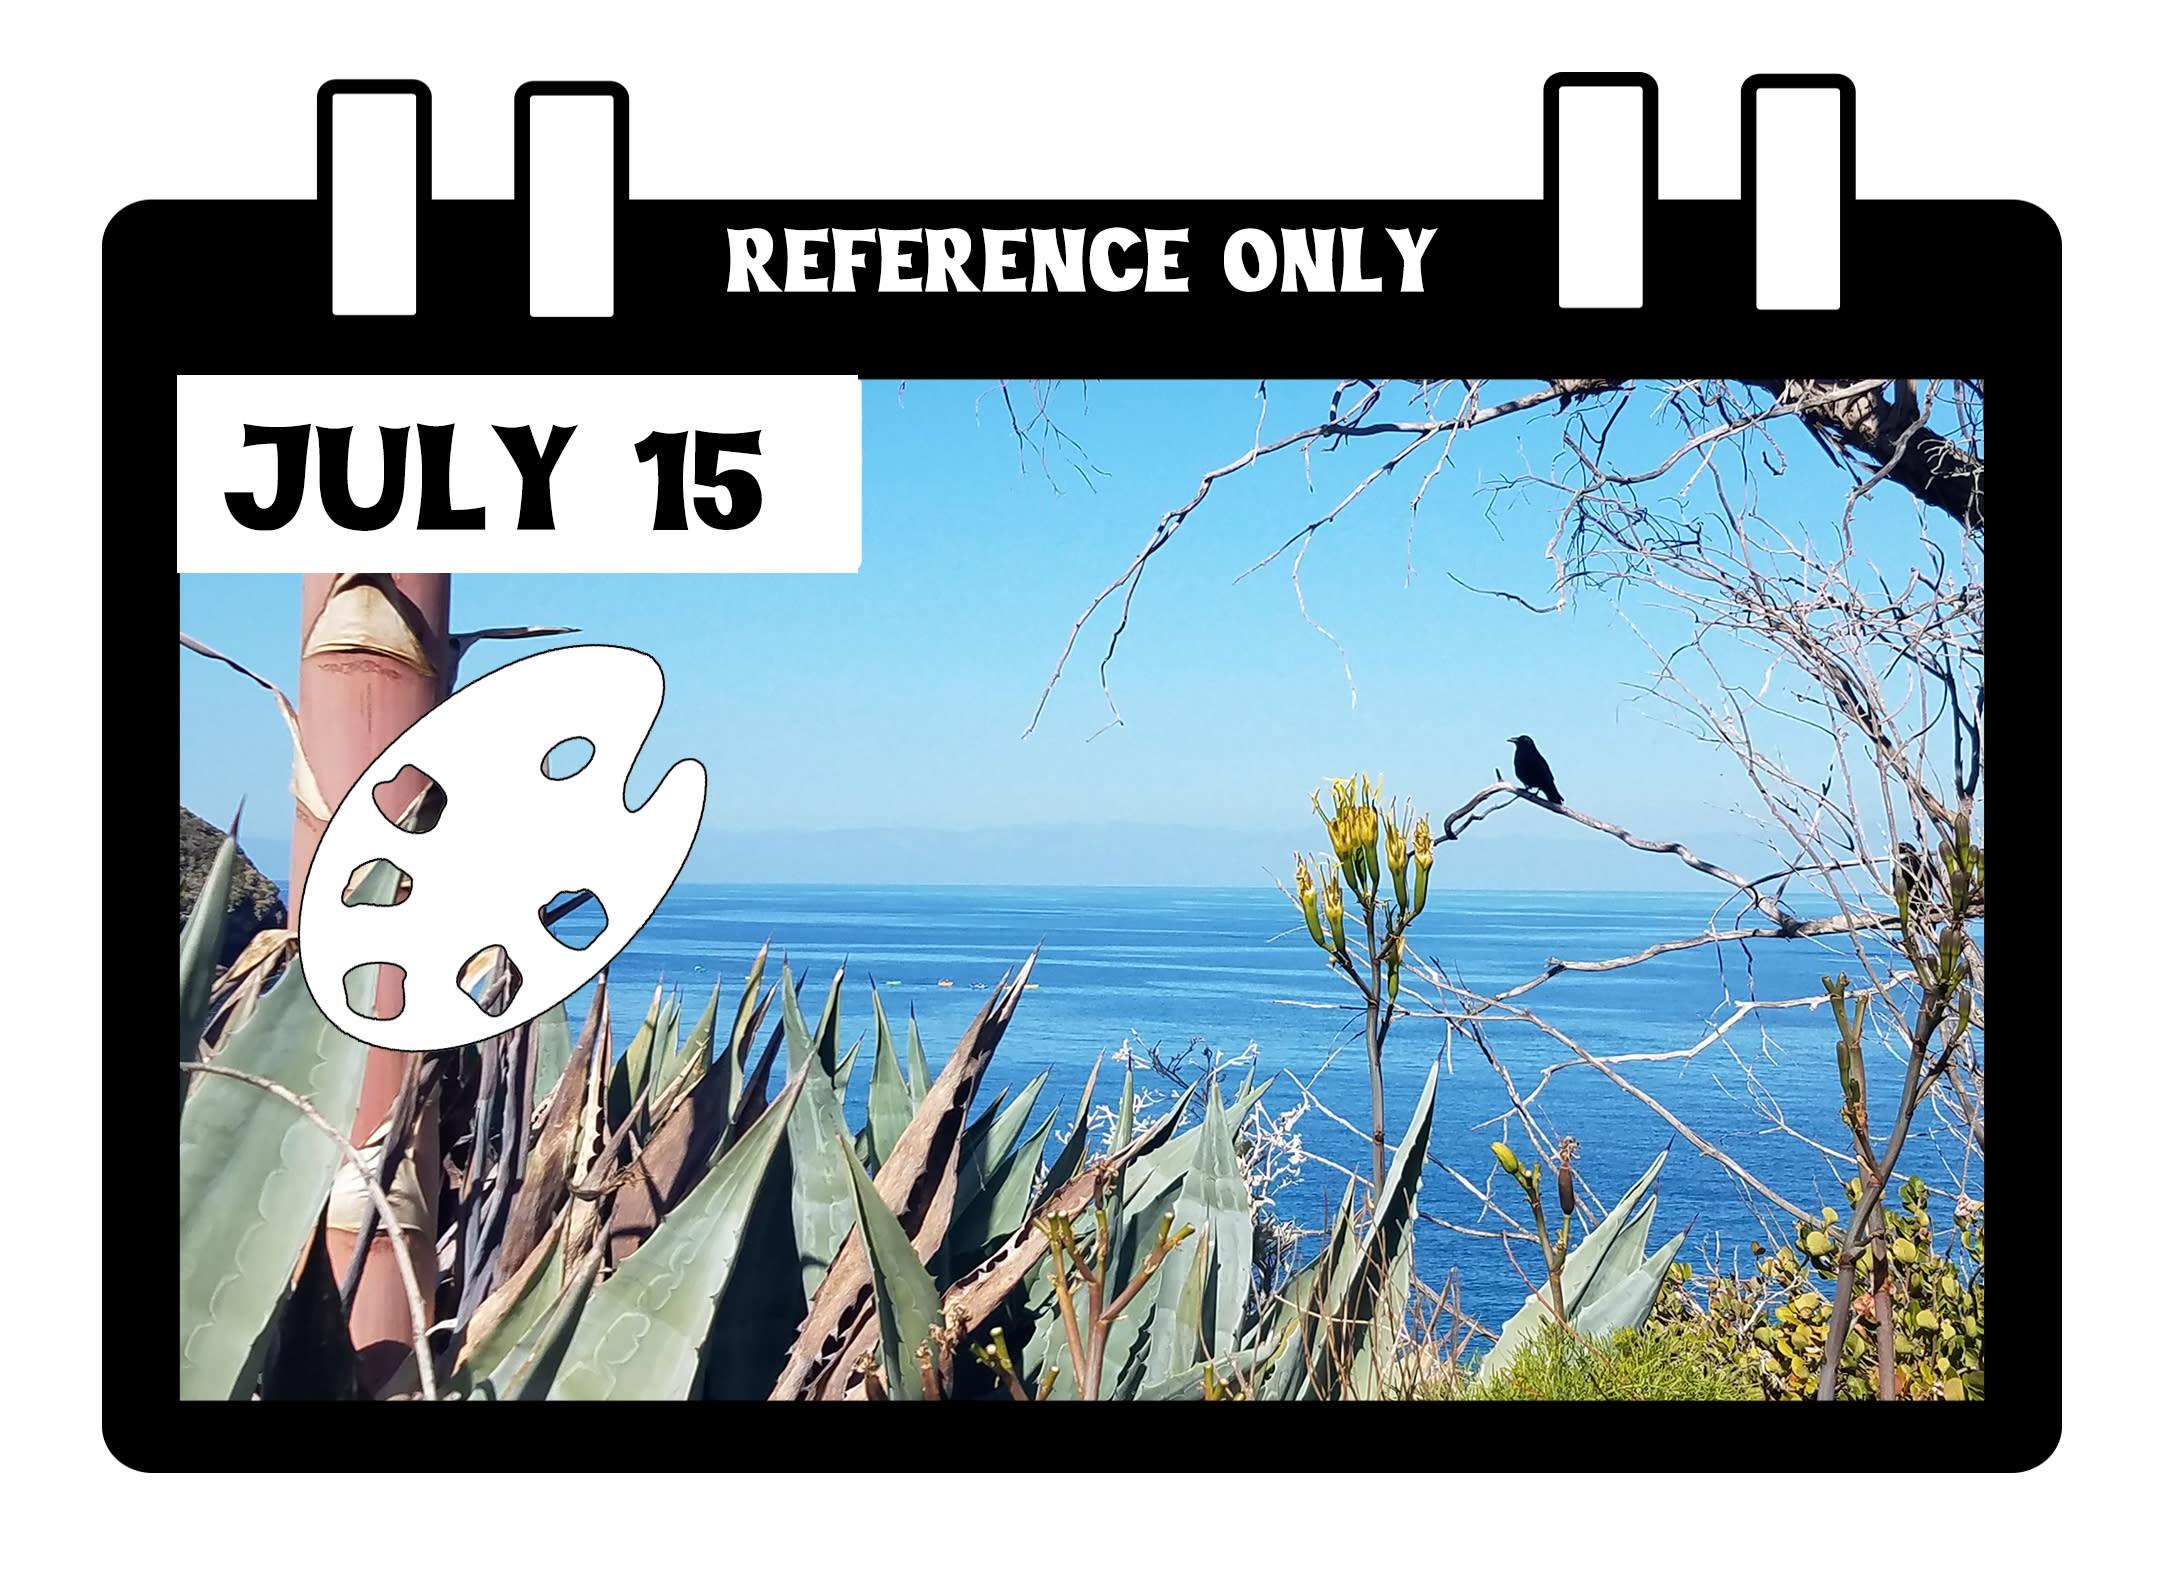 5 july 15 painting lfyrcb